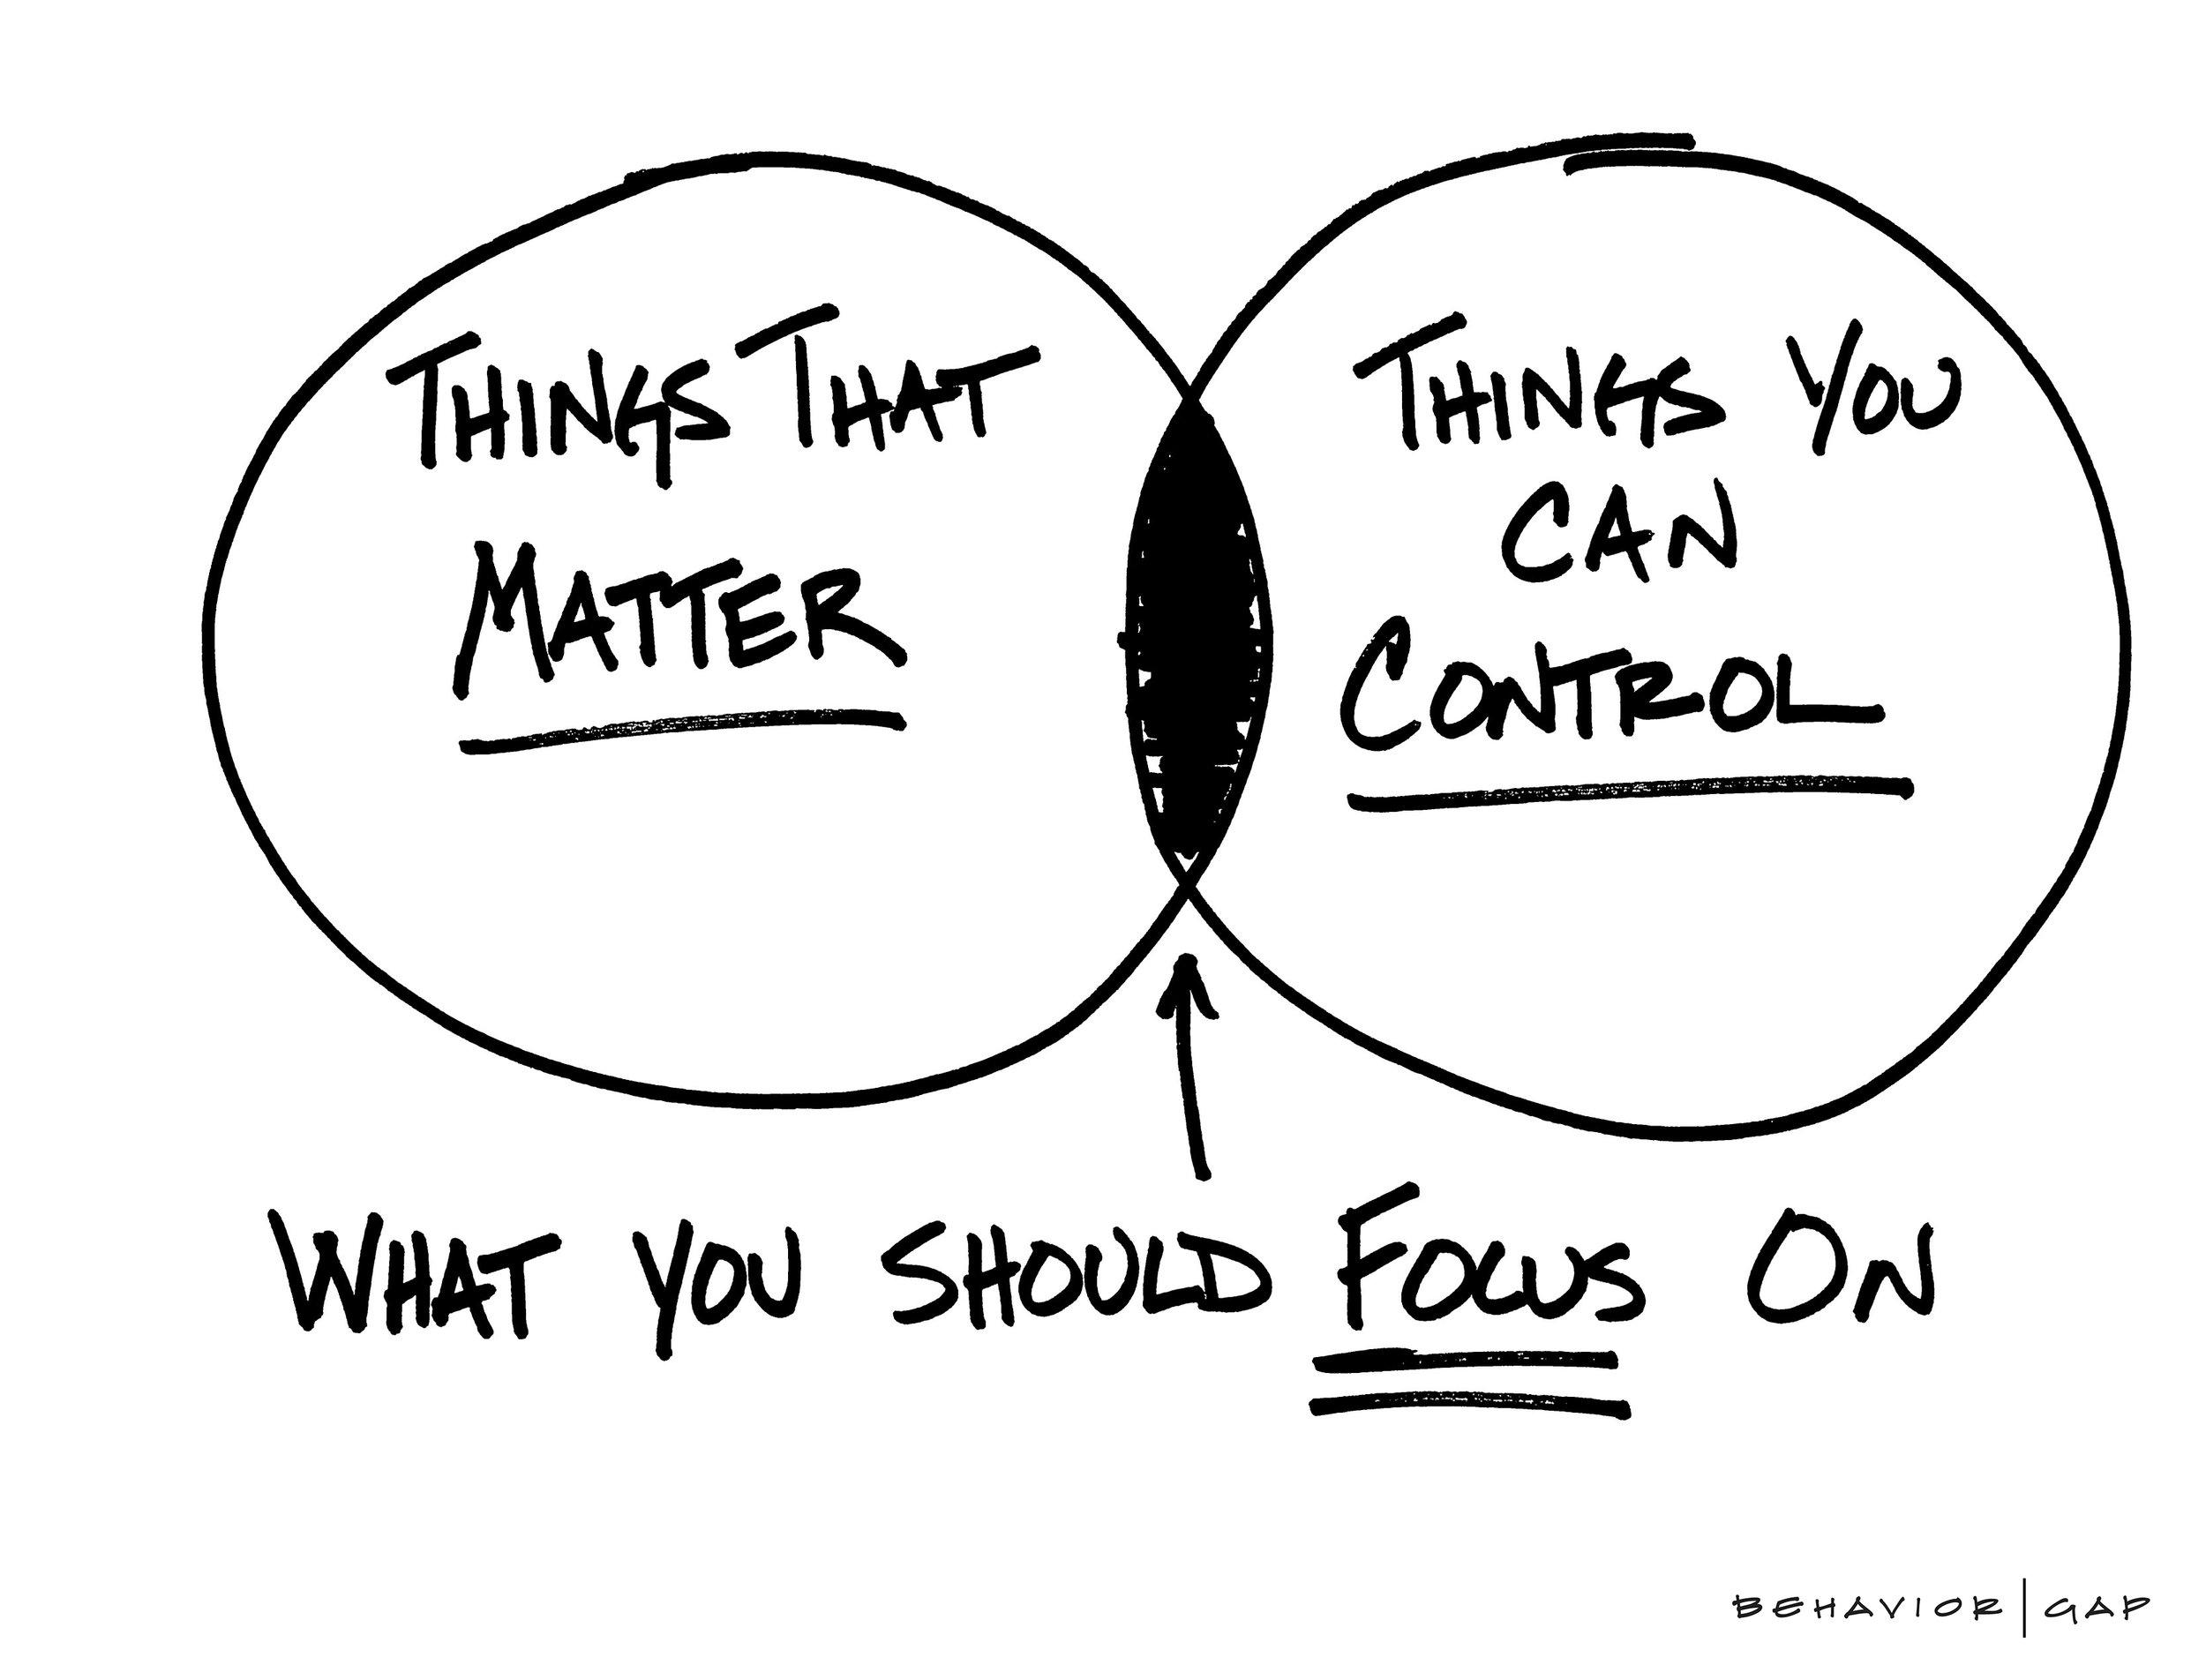 Focus Things That Matter_Behavior Gap.jpg